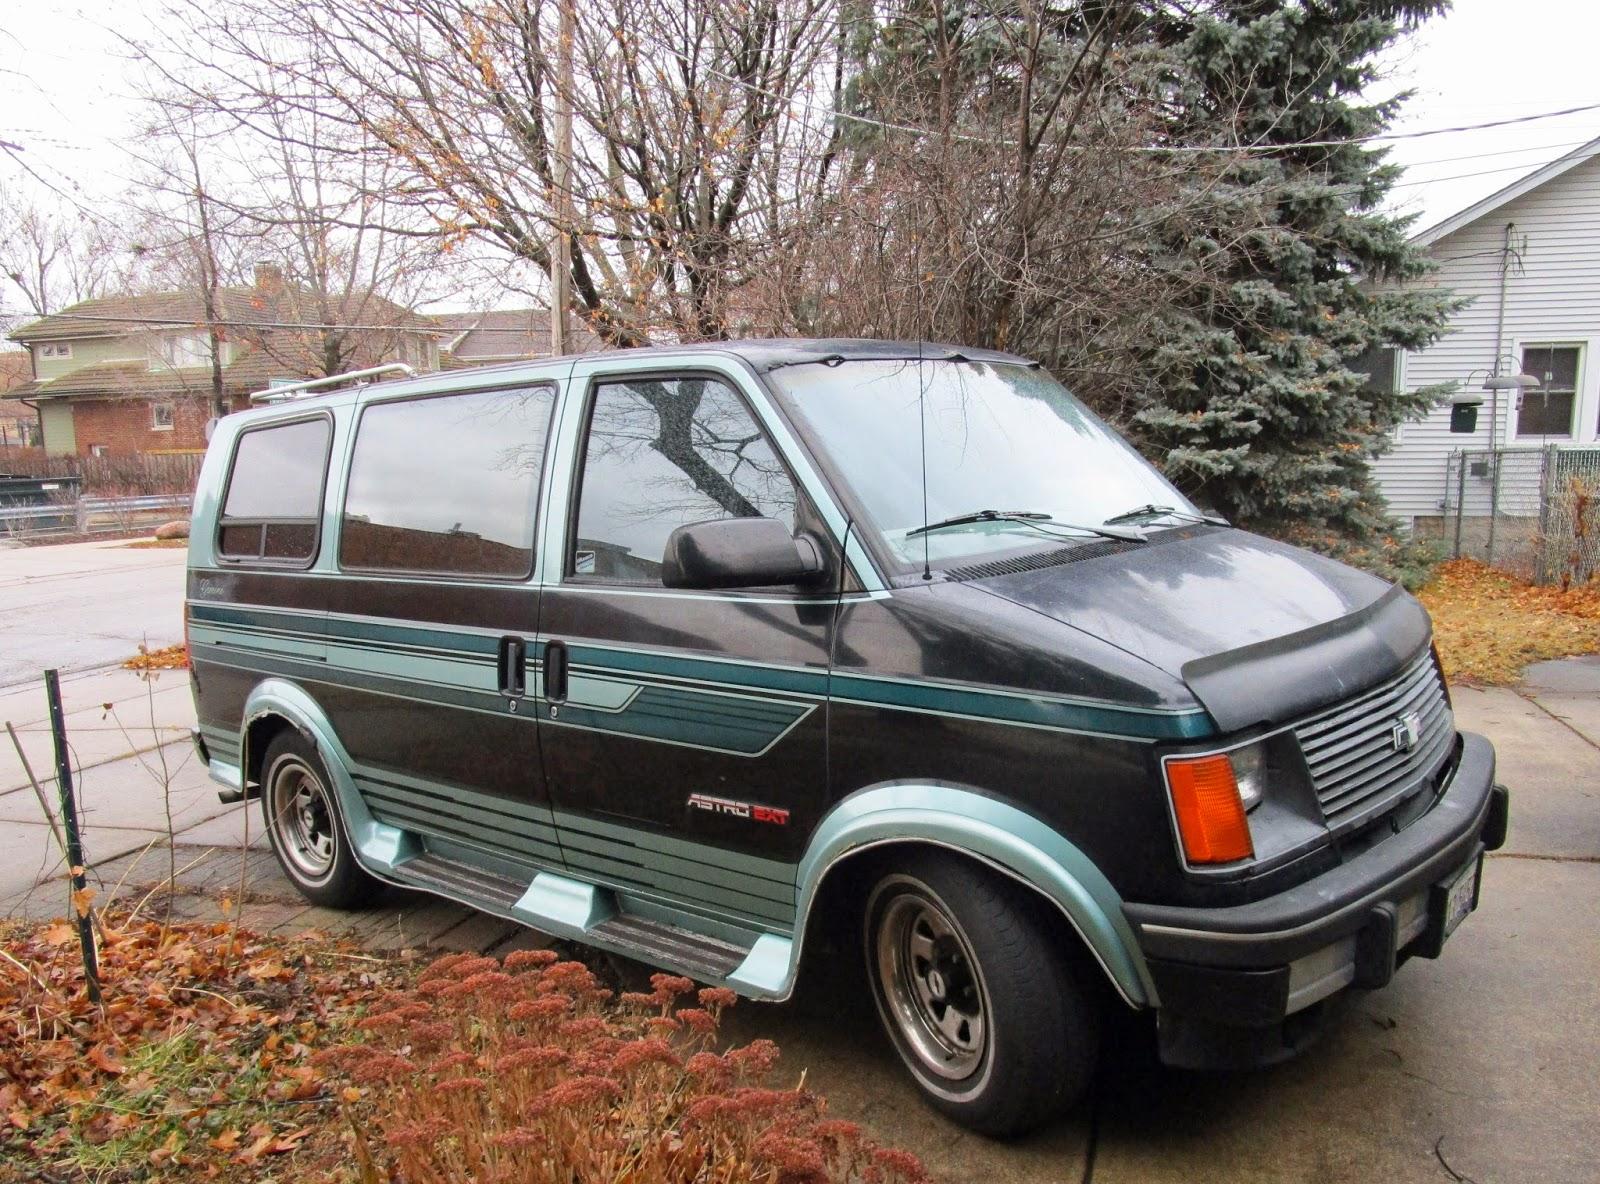 All Chevy 89 chevy van : Marathon Pundit: (Photo) 1992 Chevy Astro Van